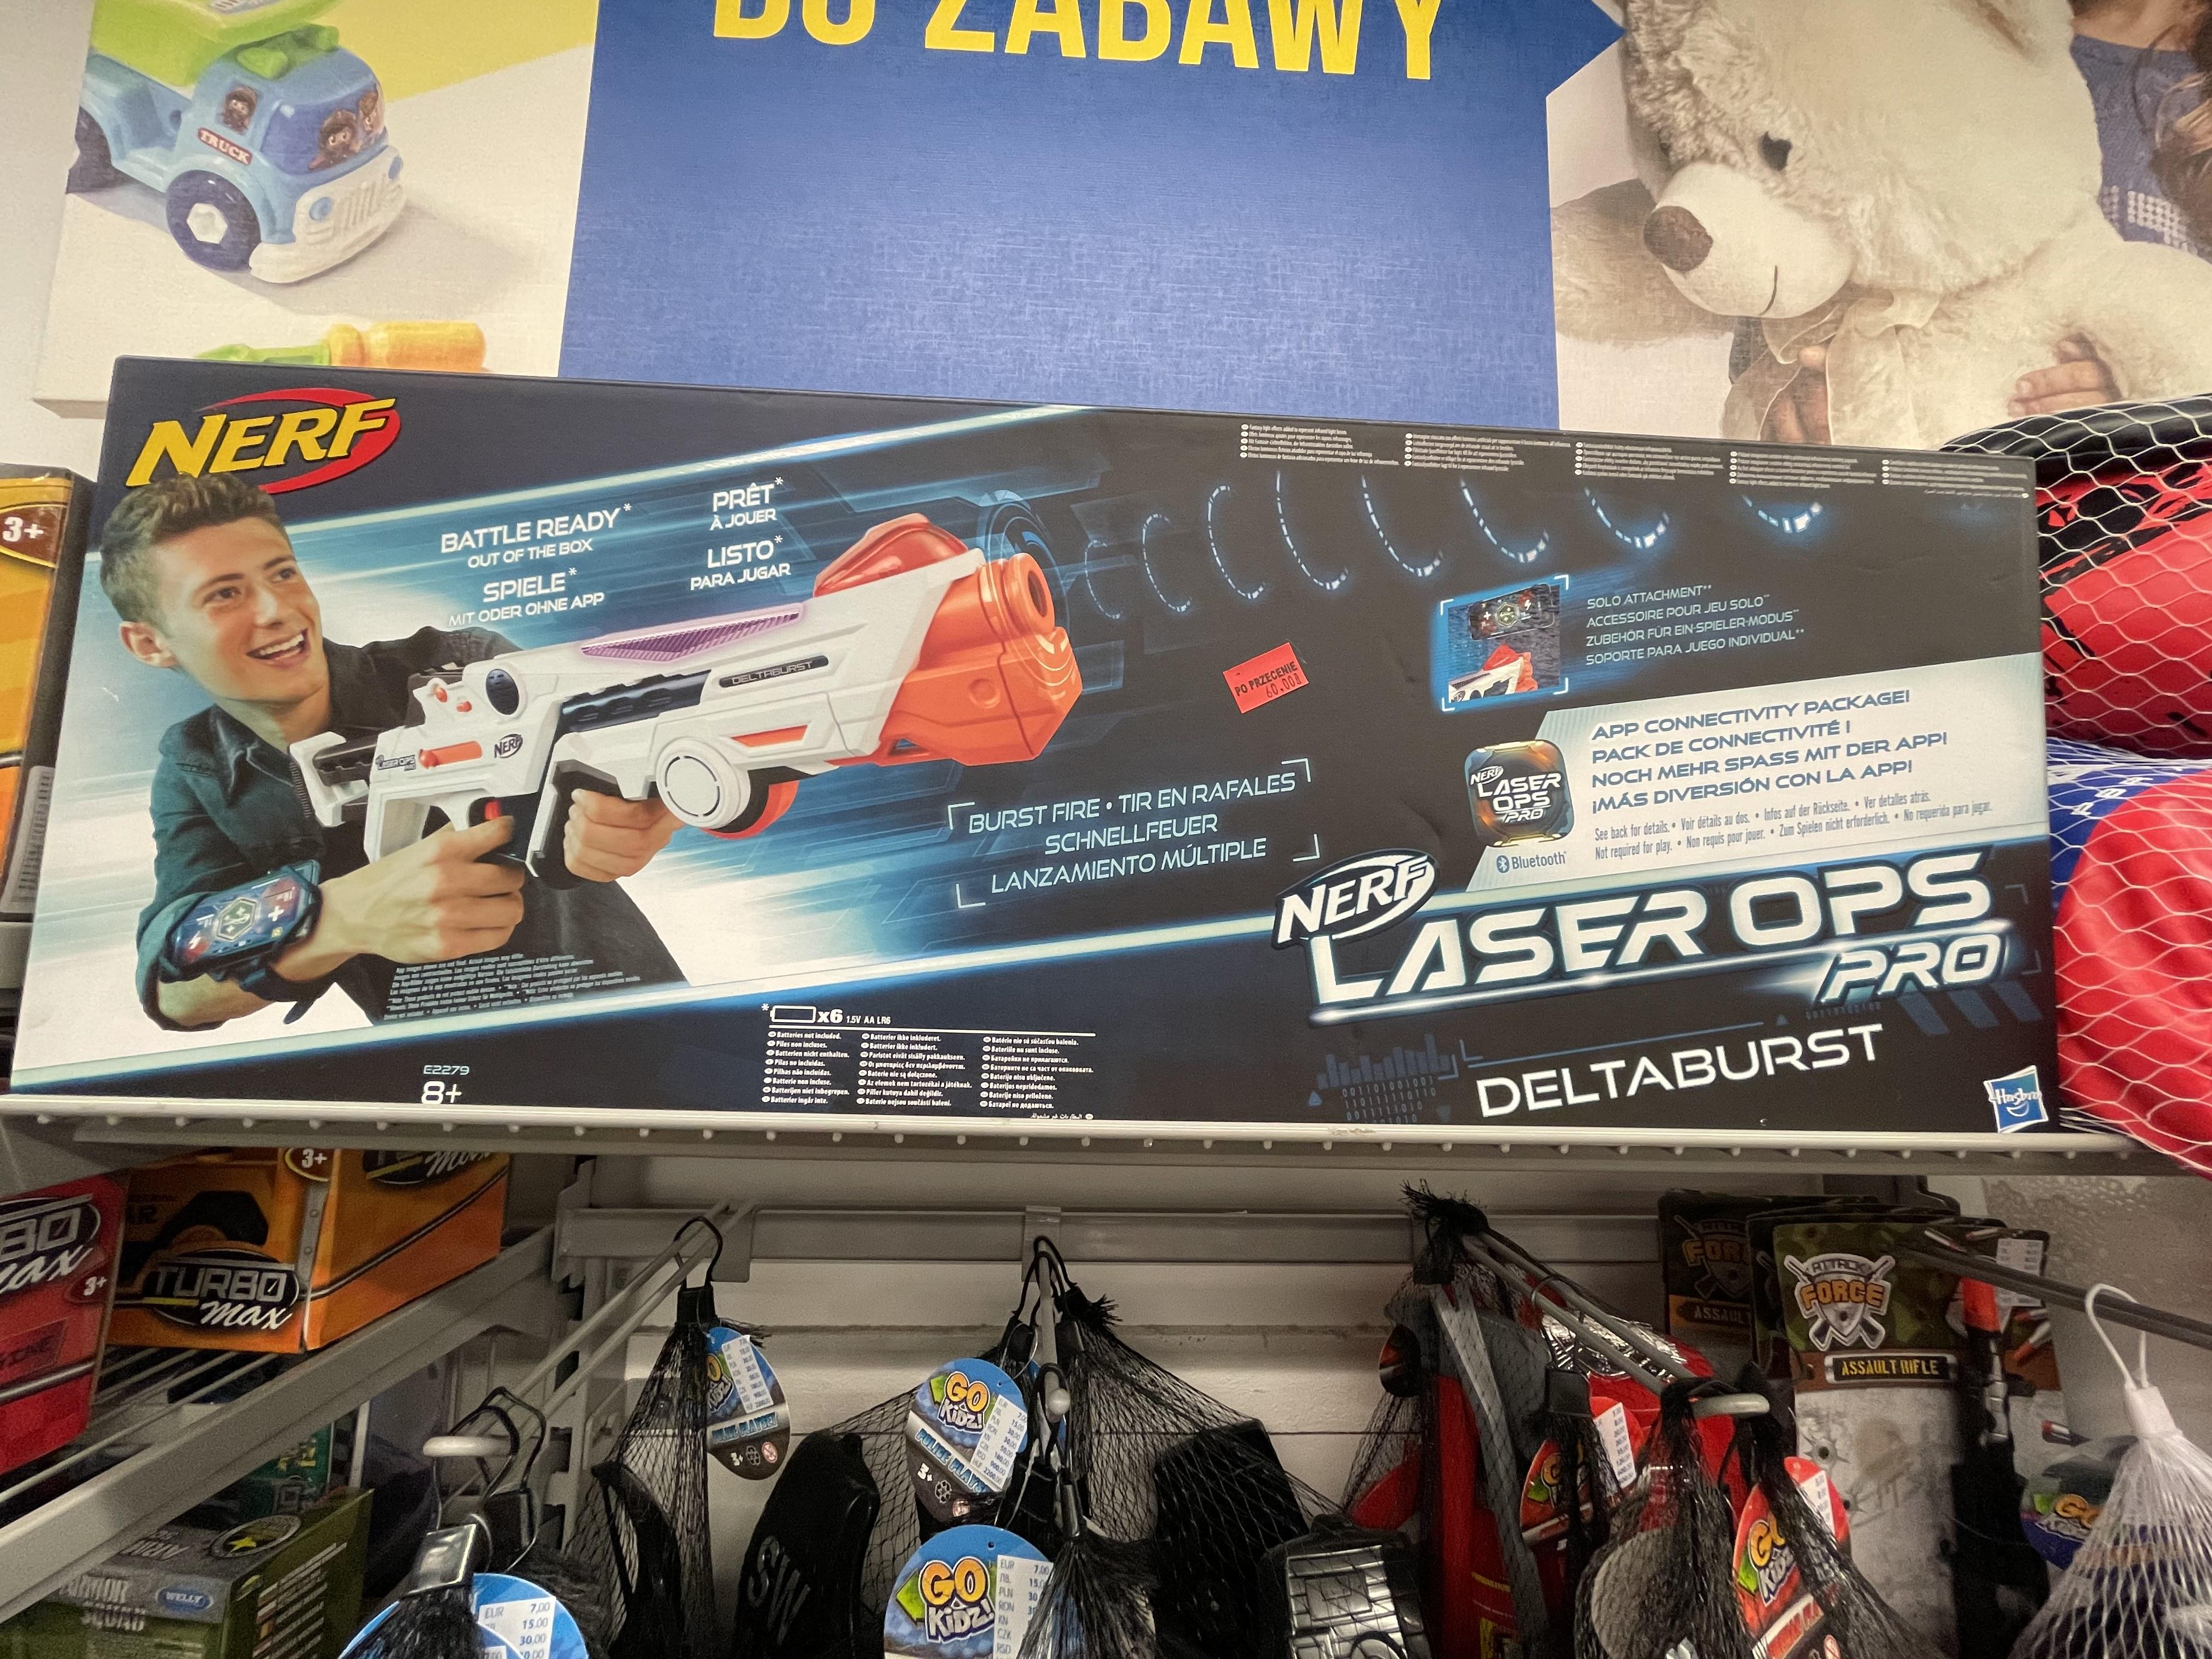 Nerf Laser Ops Pro deltaburst PEPCO